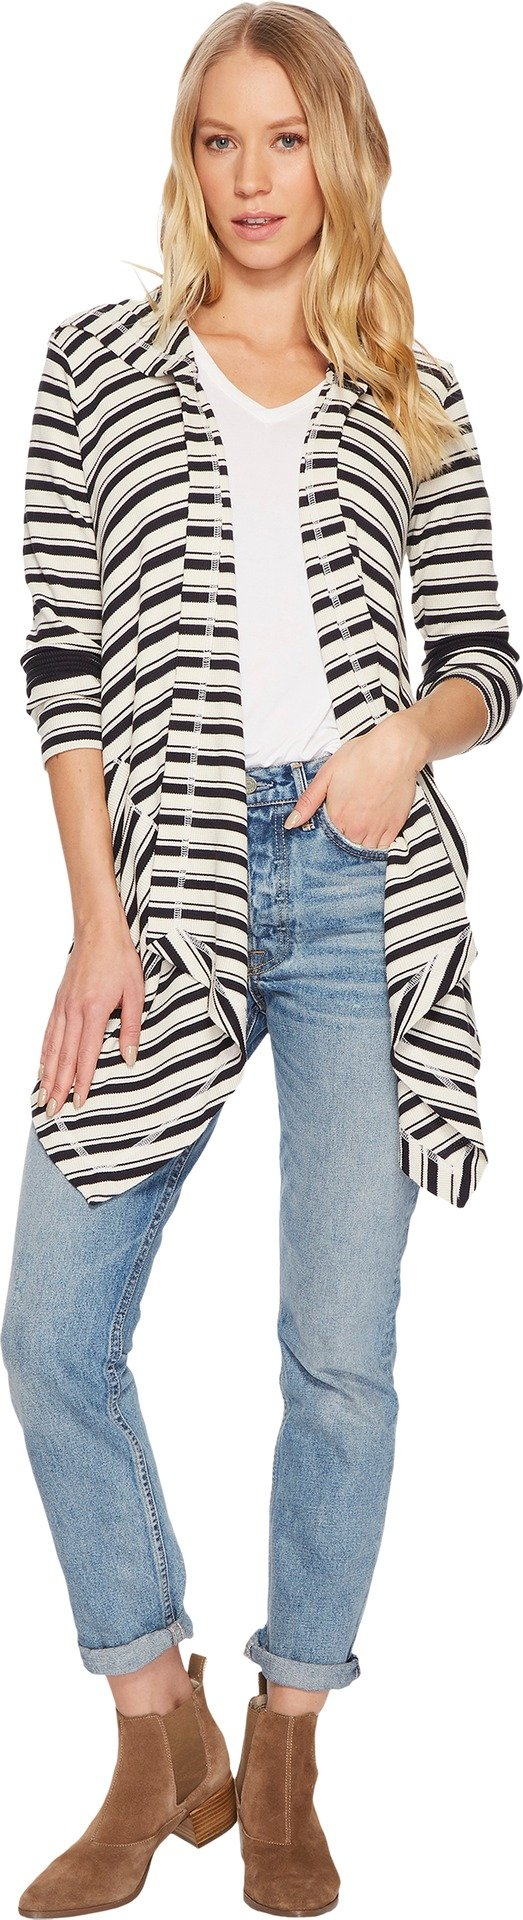 Splendid Women's Long Sleeve Cardigan, Navy Stripe, M